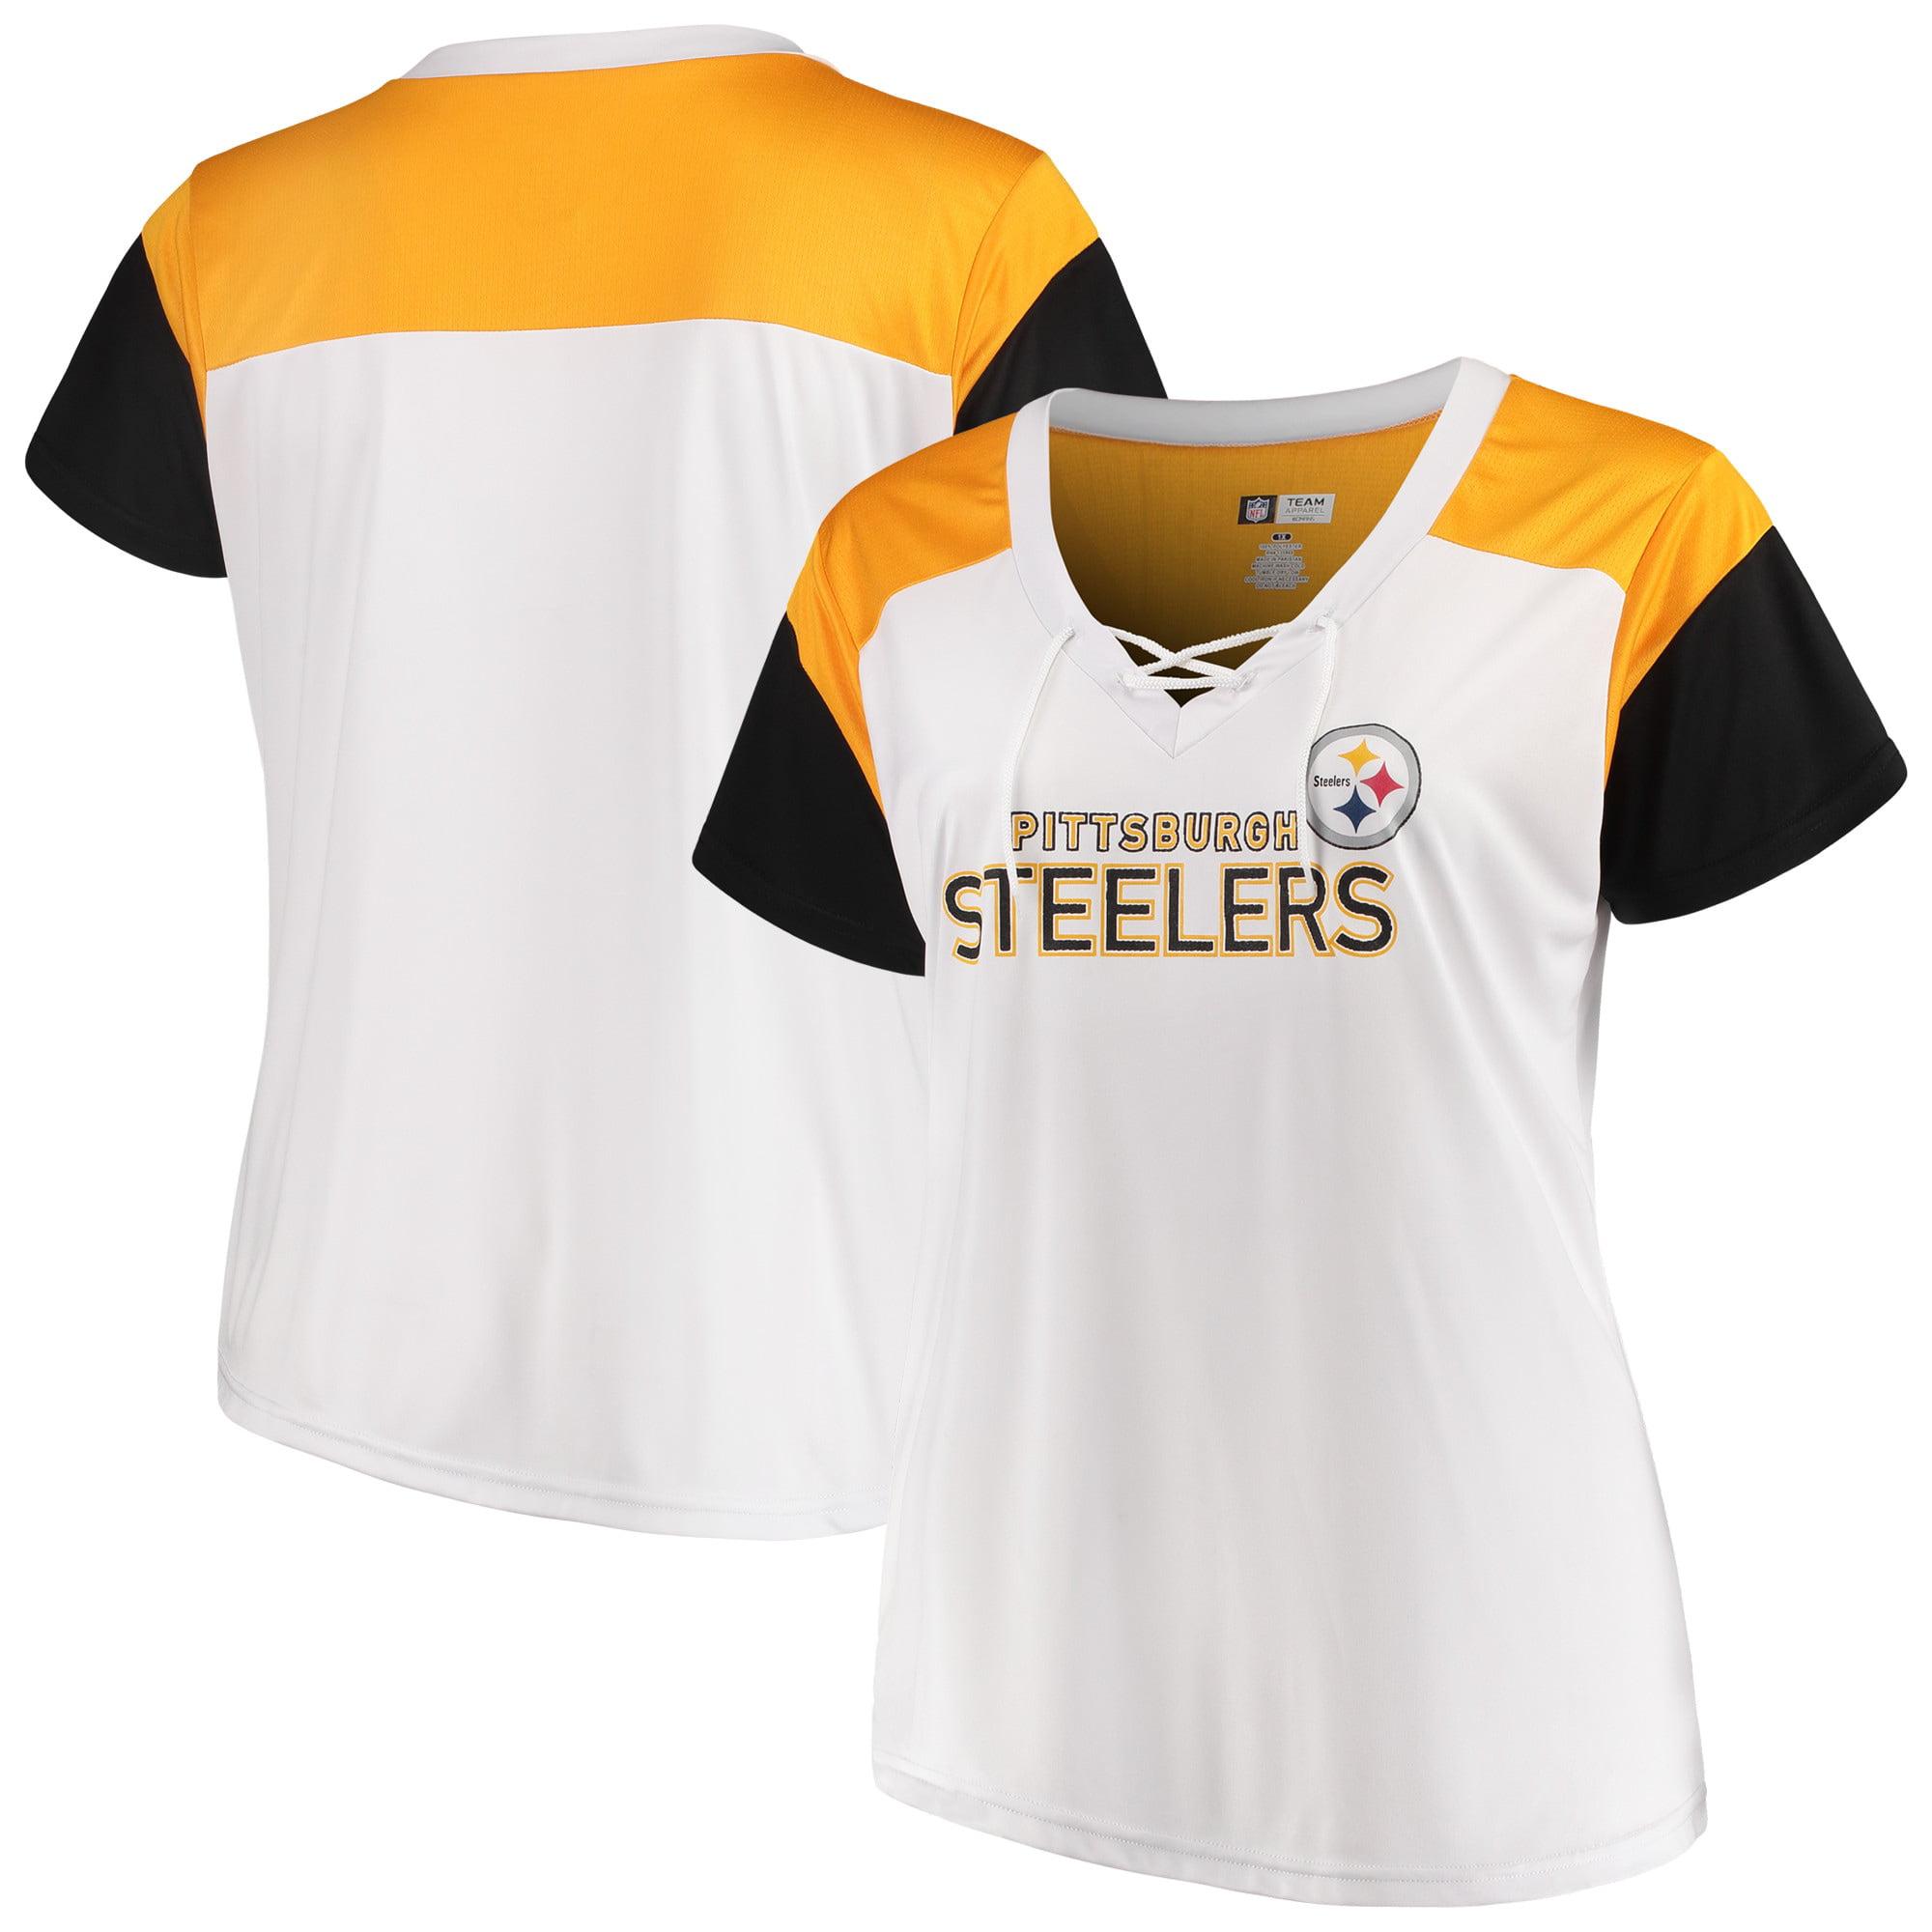 Pittsburgh Steelers Majestic Mesh Polyester Jersey Shirt